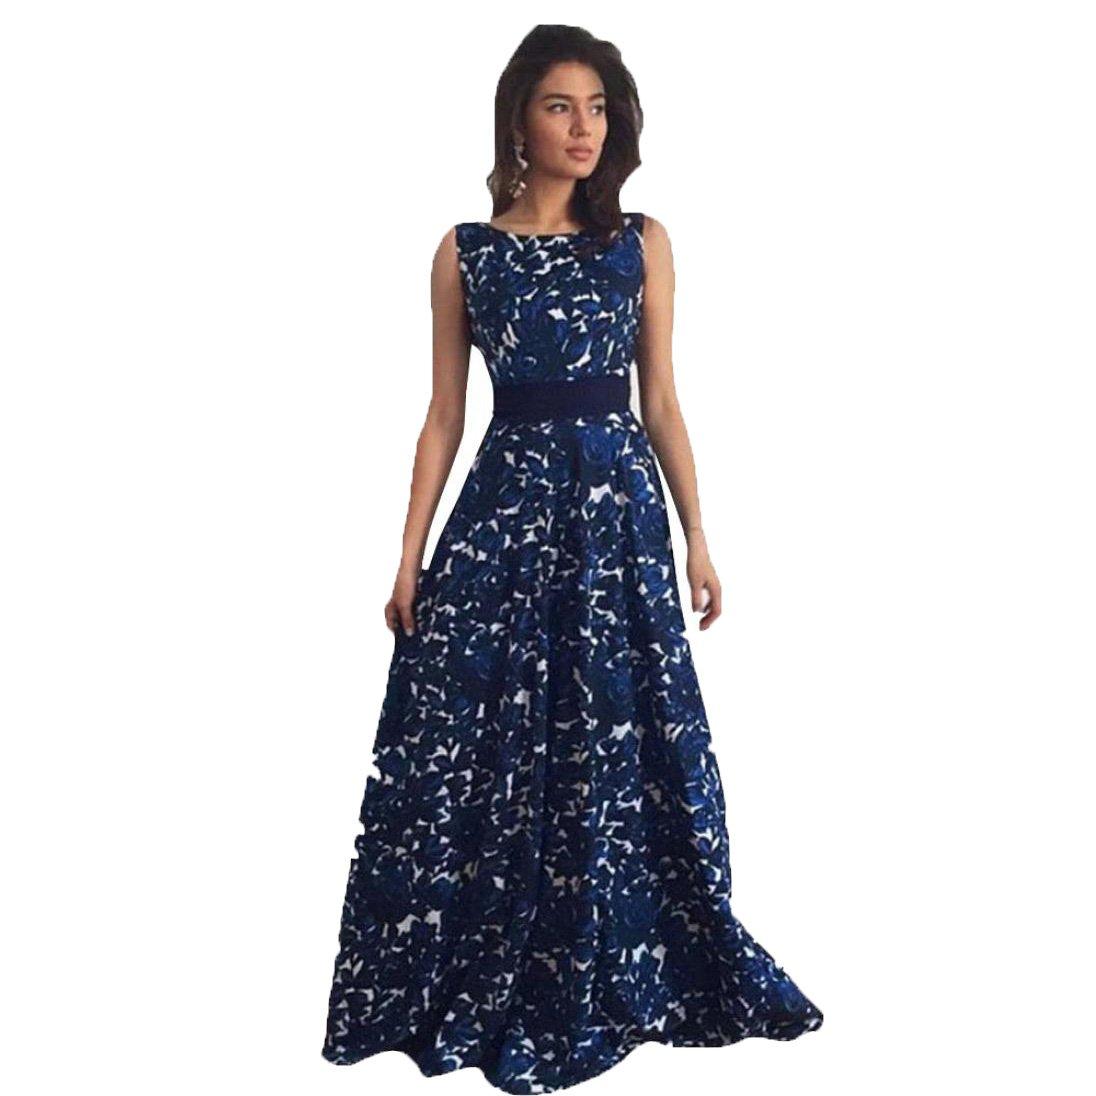 Internet Women Floral Formal Prom Dress Party Ball Gown Long Evening Dress (L, Blue): Amazon.co.uk: Beauty